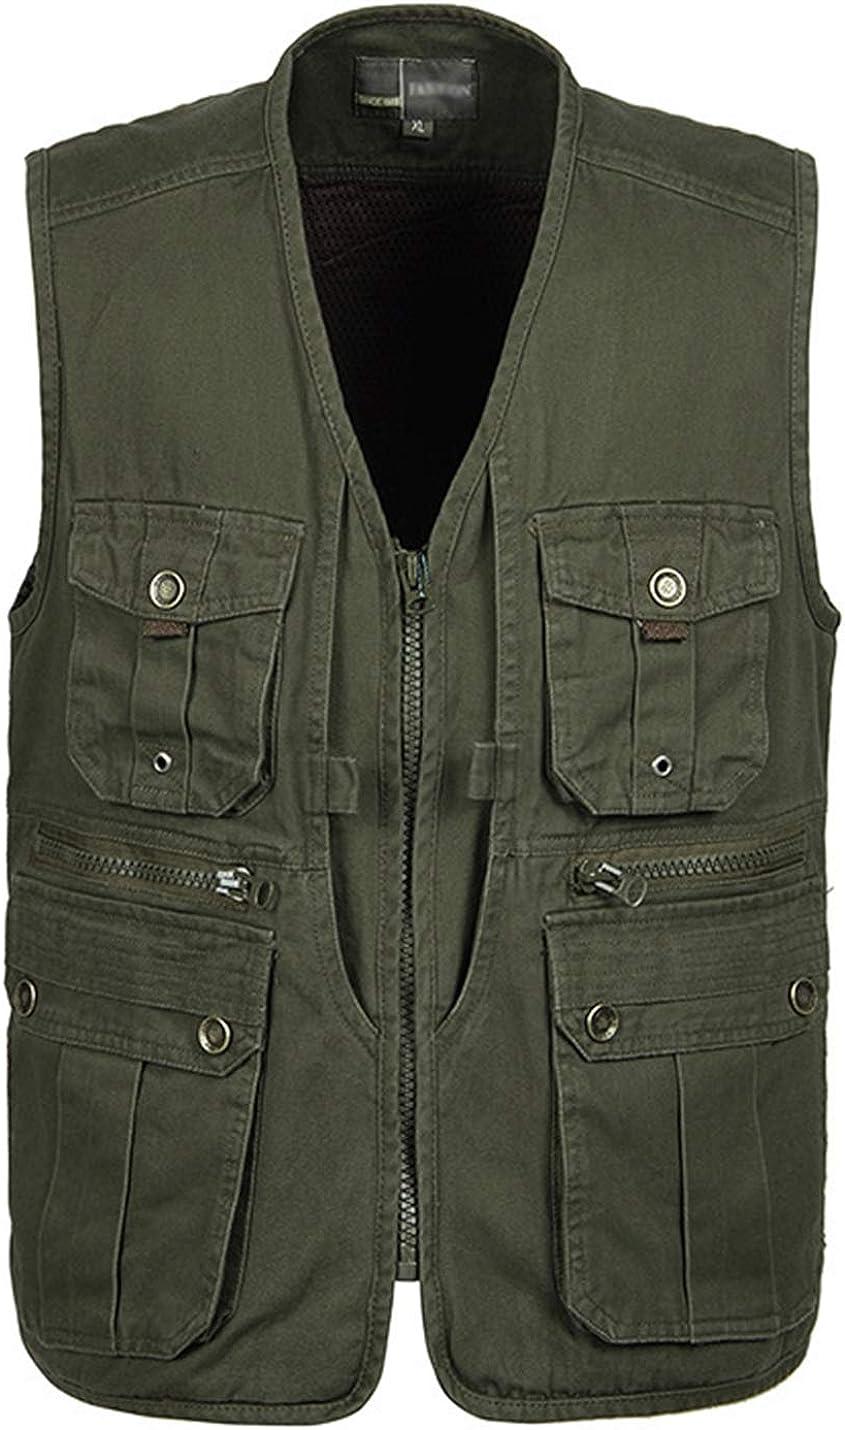 Yimoon Men's Sleeveless Zip Up Fishing Photo Safari Outdoor Vest with Pockets